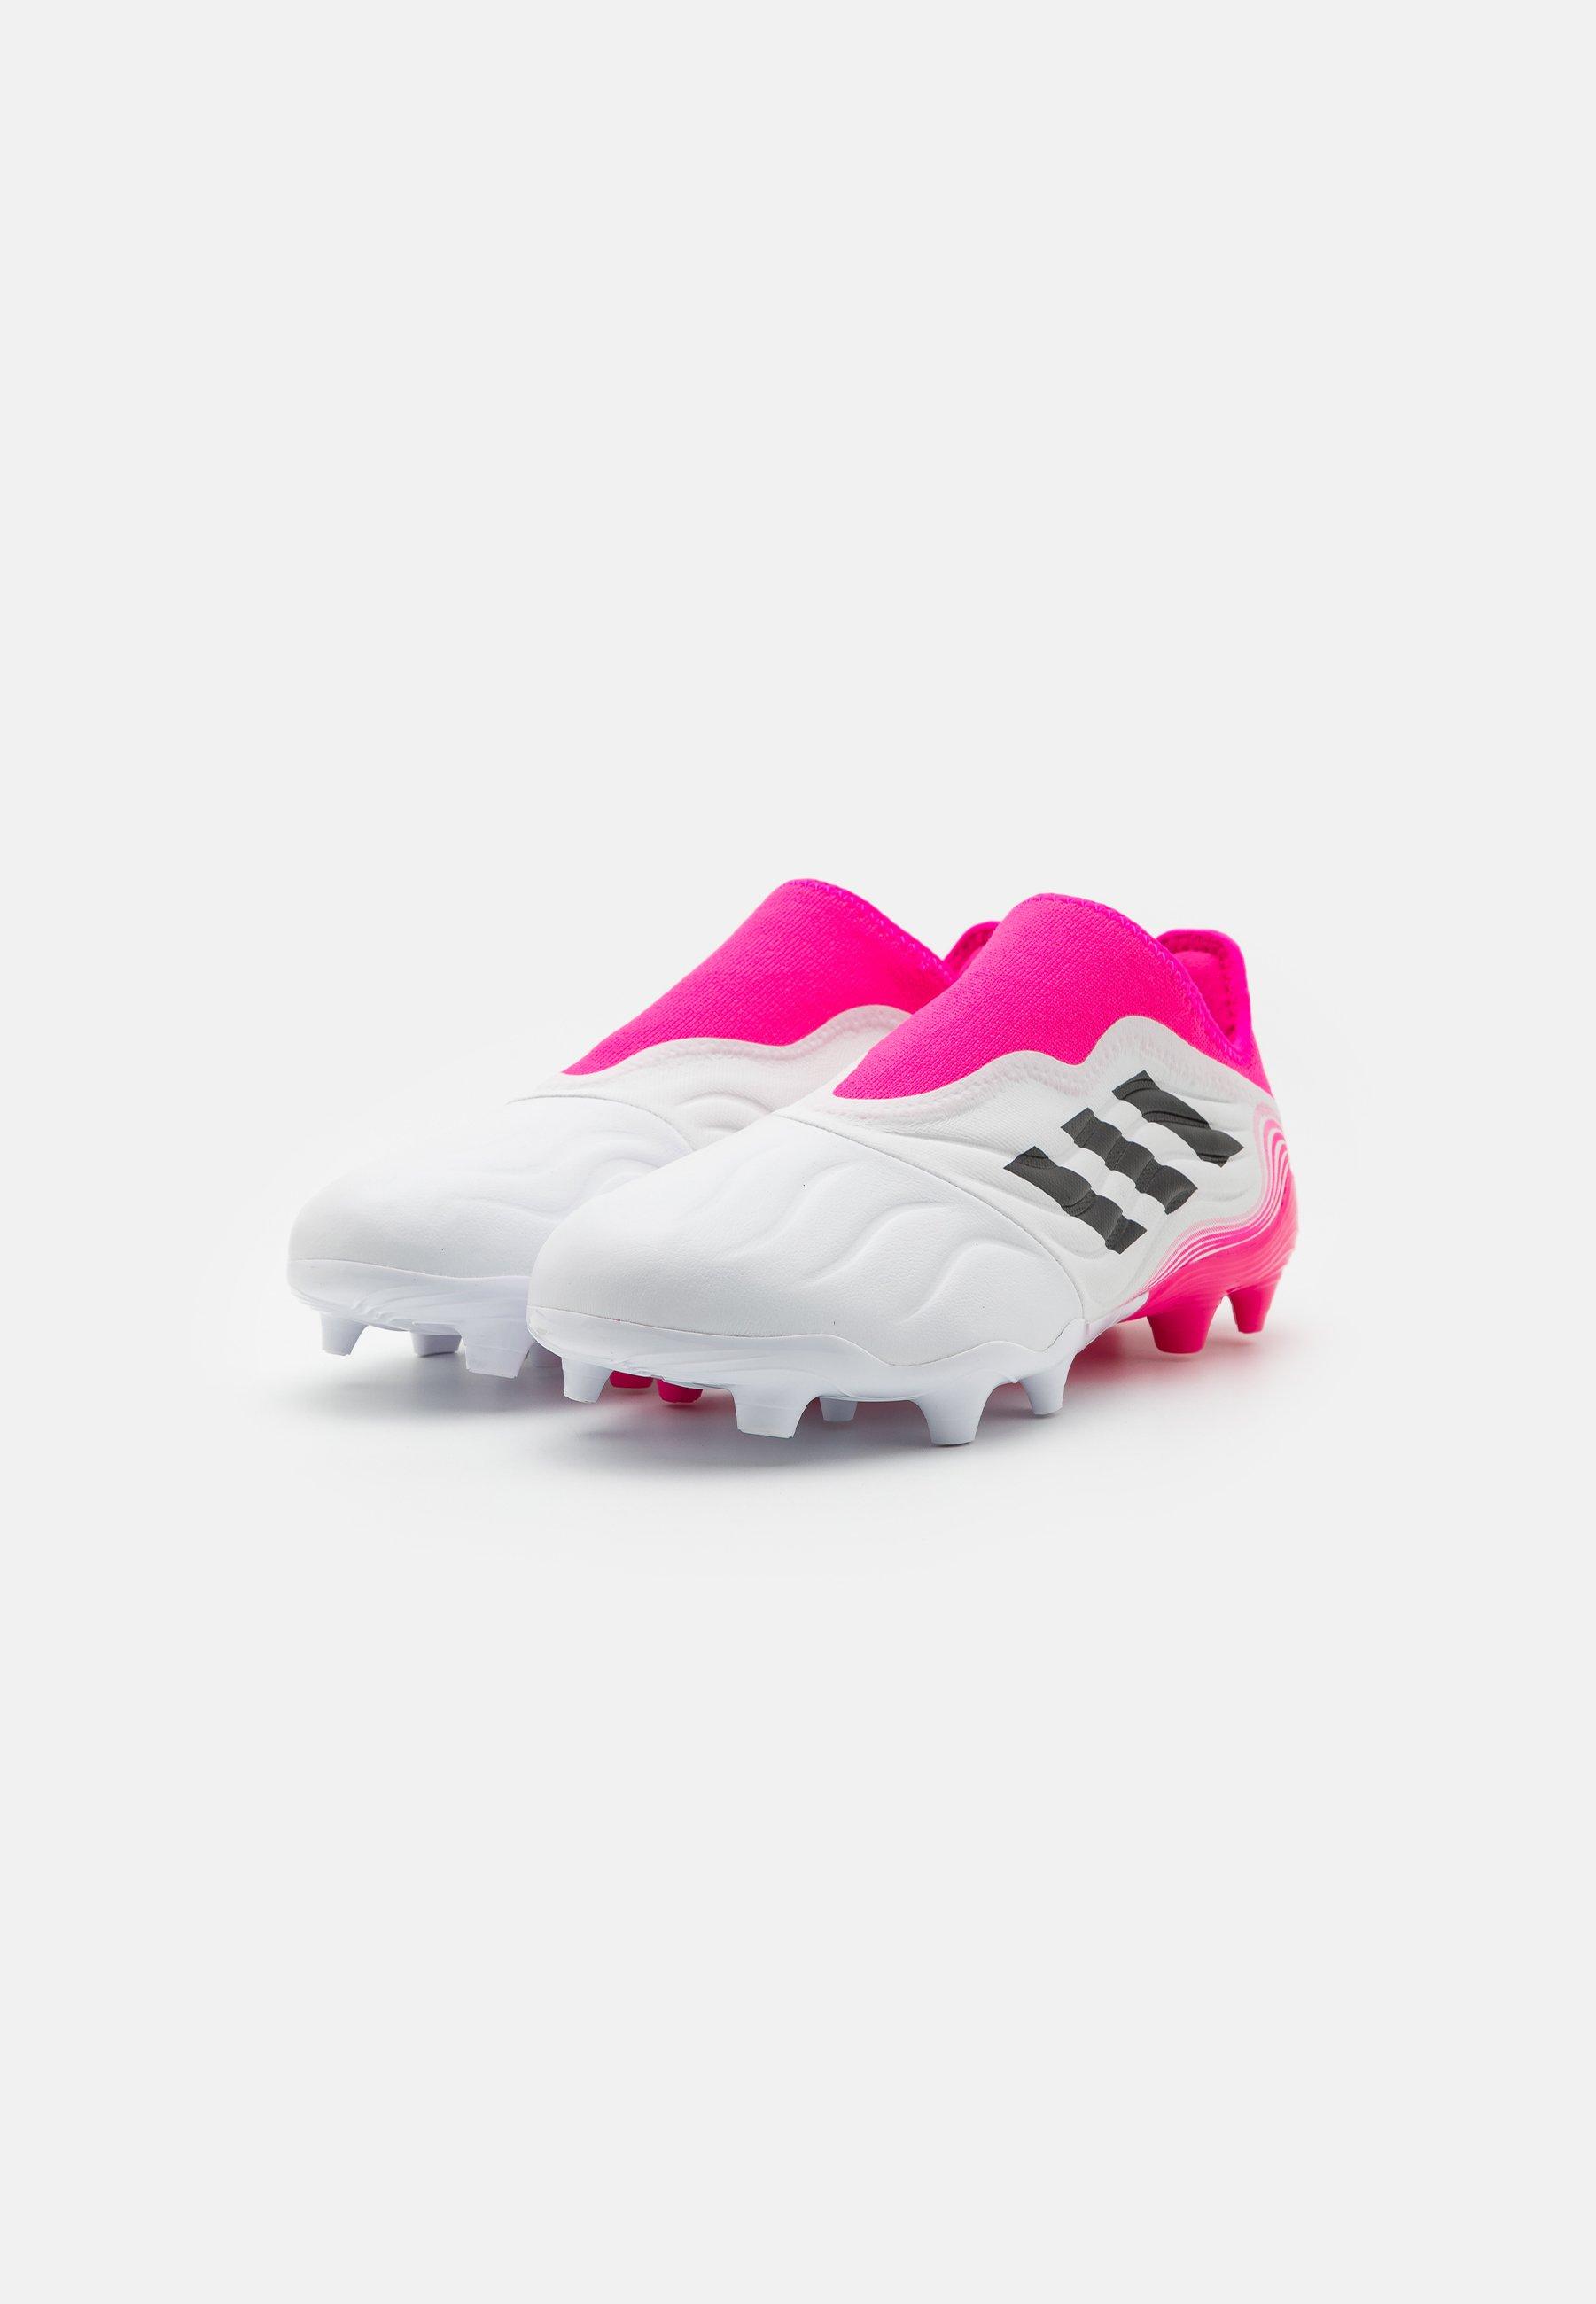 Homme COPA SENSE.3 LL FG - Chaussures de foot à crampons